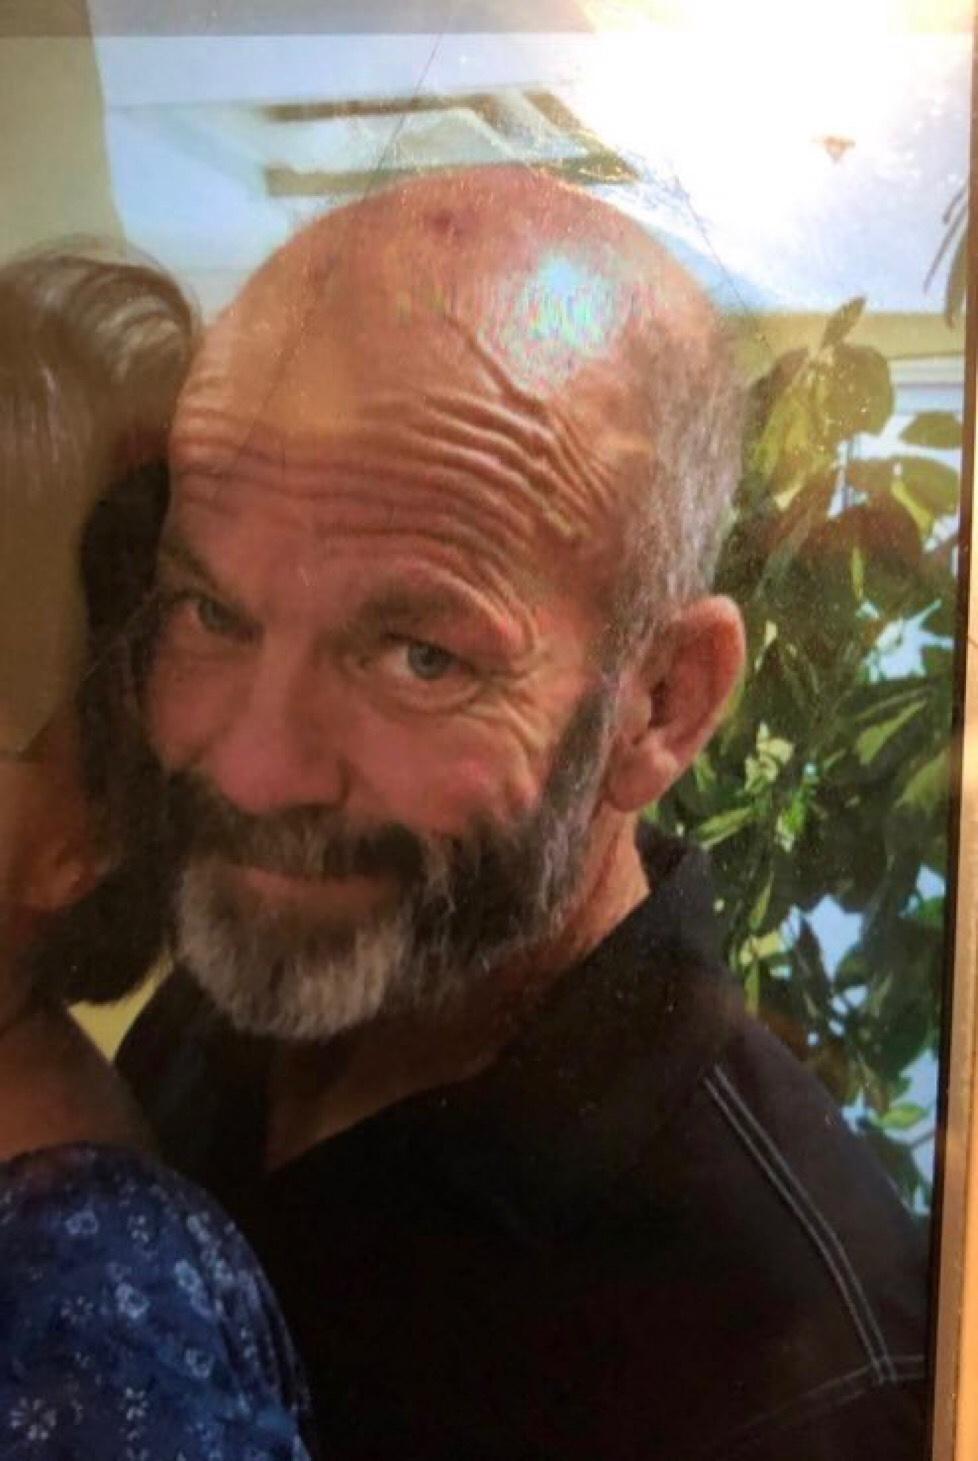 Kingston Police seeking assistance to locate missing man